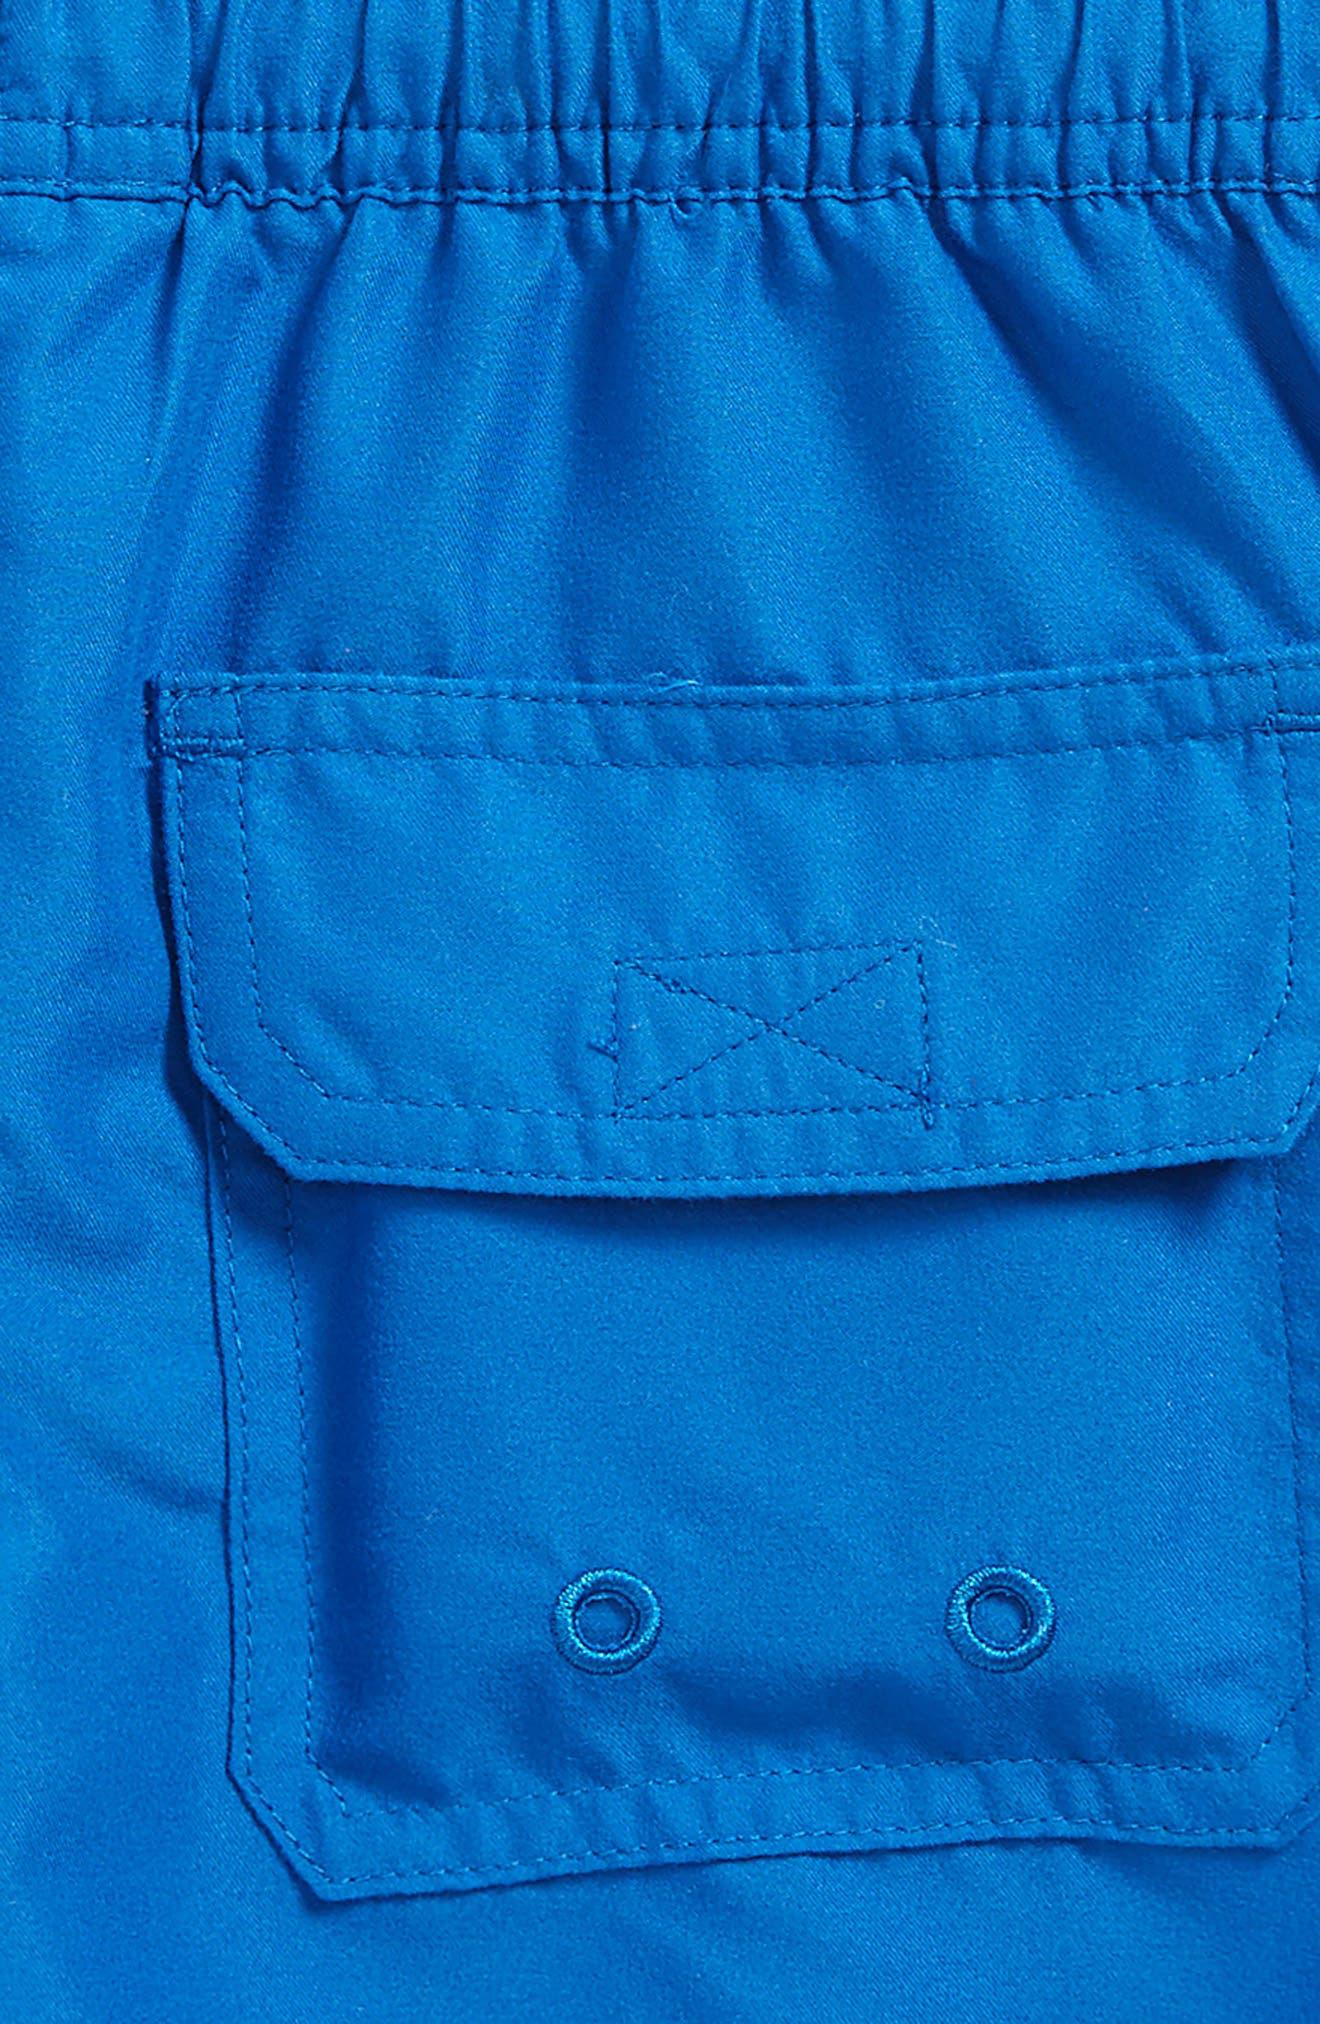 Bungalow Board Shorts,                             Alternate thumbnail 3, color,                             Yacht Blue